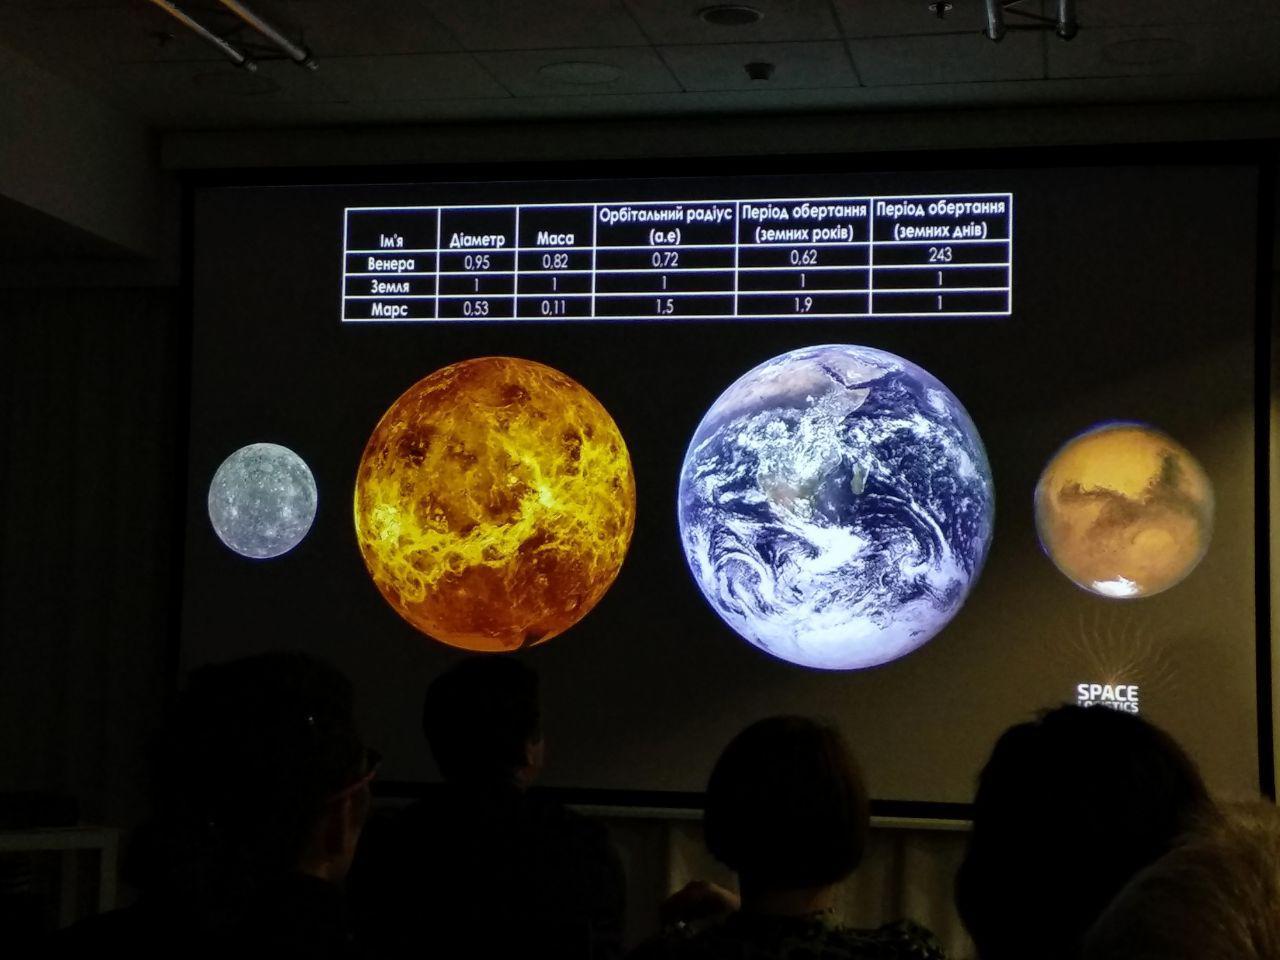 Забудьте о Марсе, украинцы готовы покорять Венеру